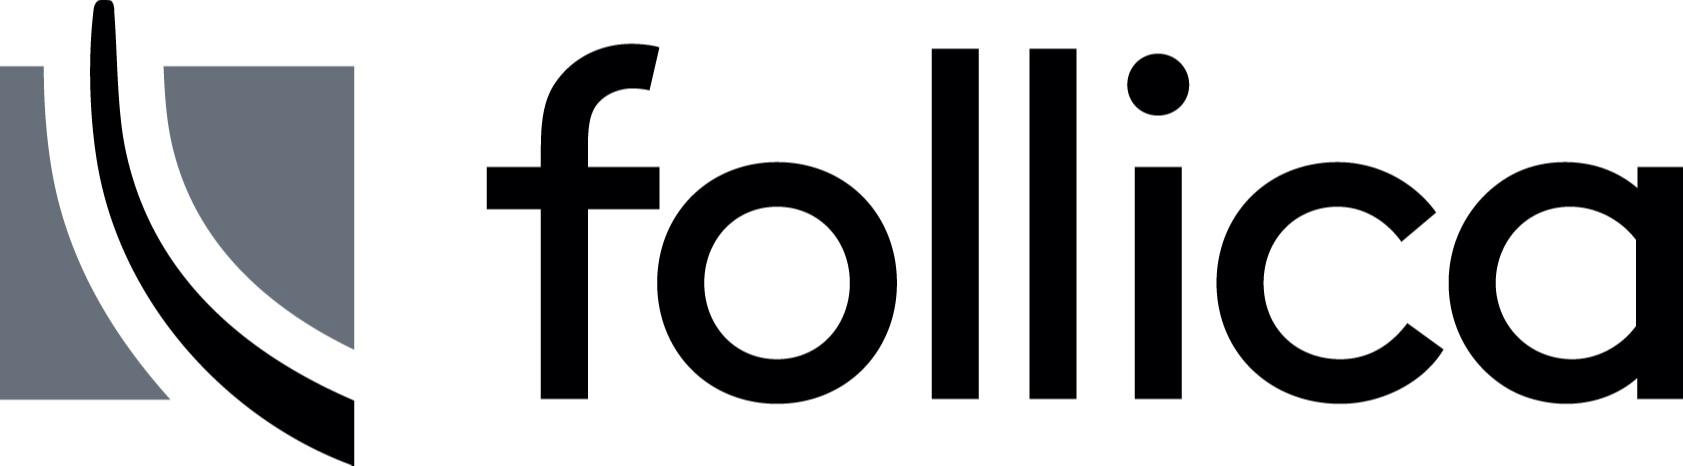 follica_logo_new_black.jpg